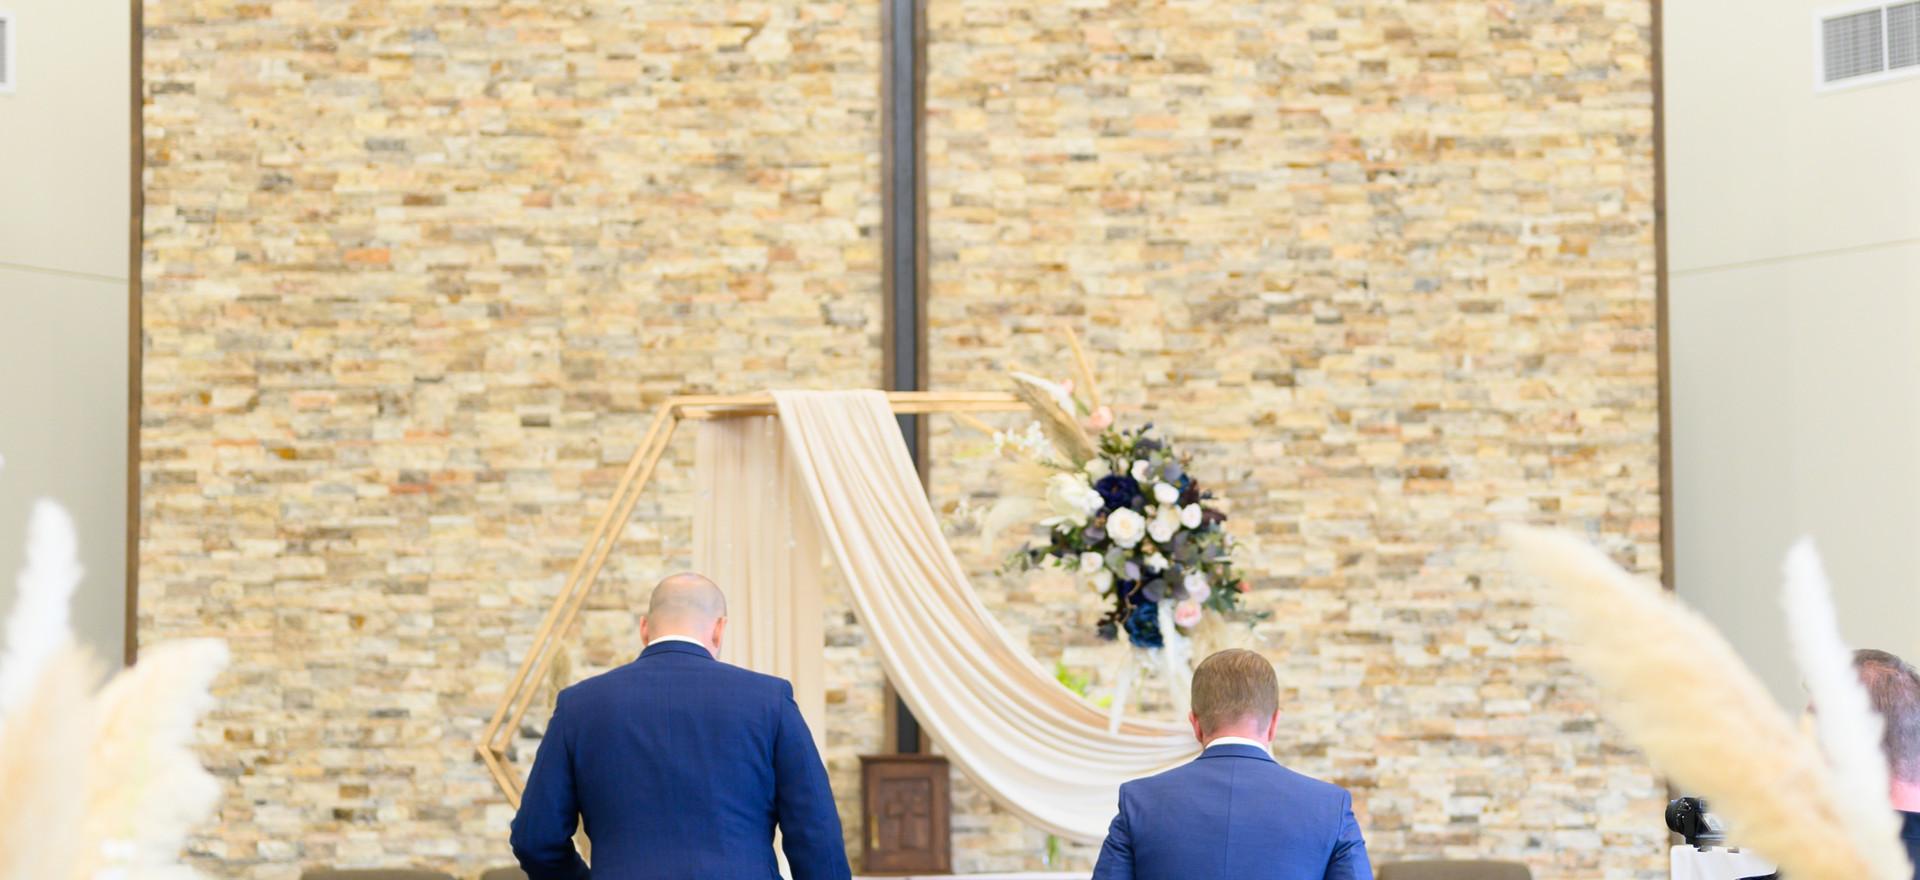 043_Lorena and Mike's Wedding day.jpg